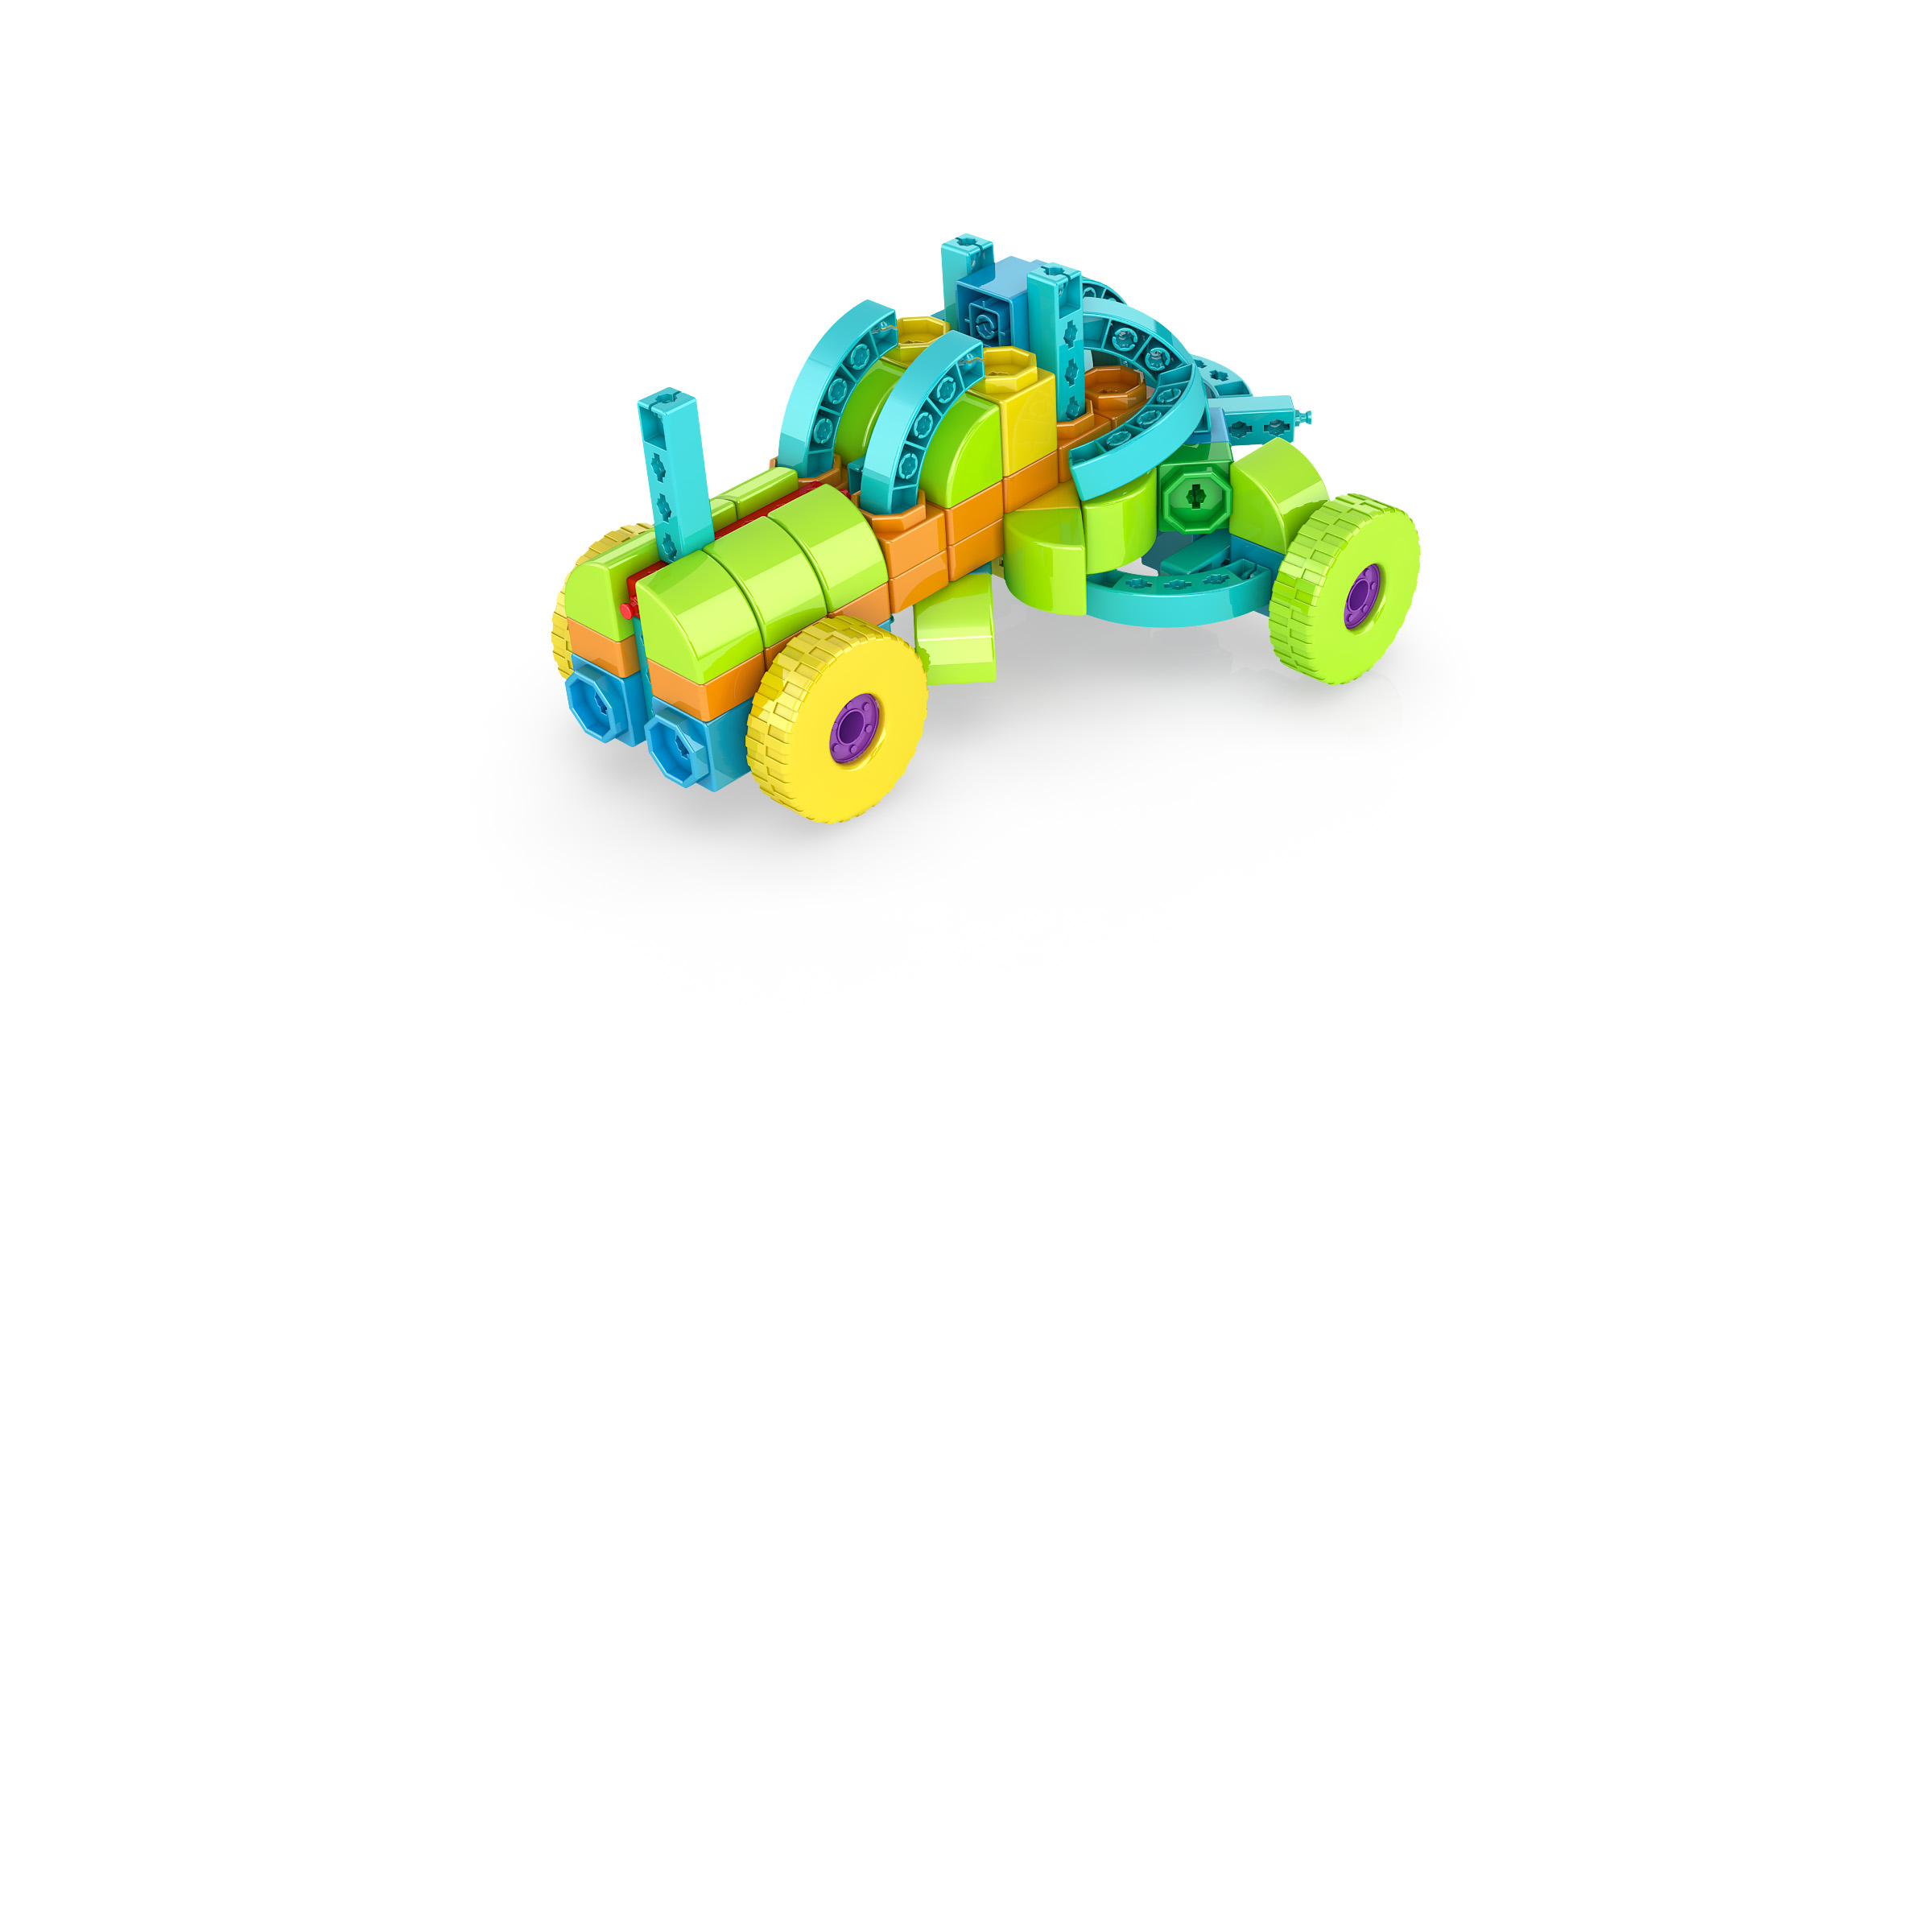 , FunnyDragsterTracktor, משחקי חשיבה לילדים engino, משחקים לגיל הרך playgro, משחק הרכבות אנג'ינו, משחקי רכבות